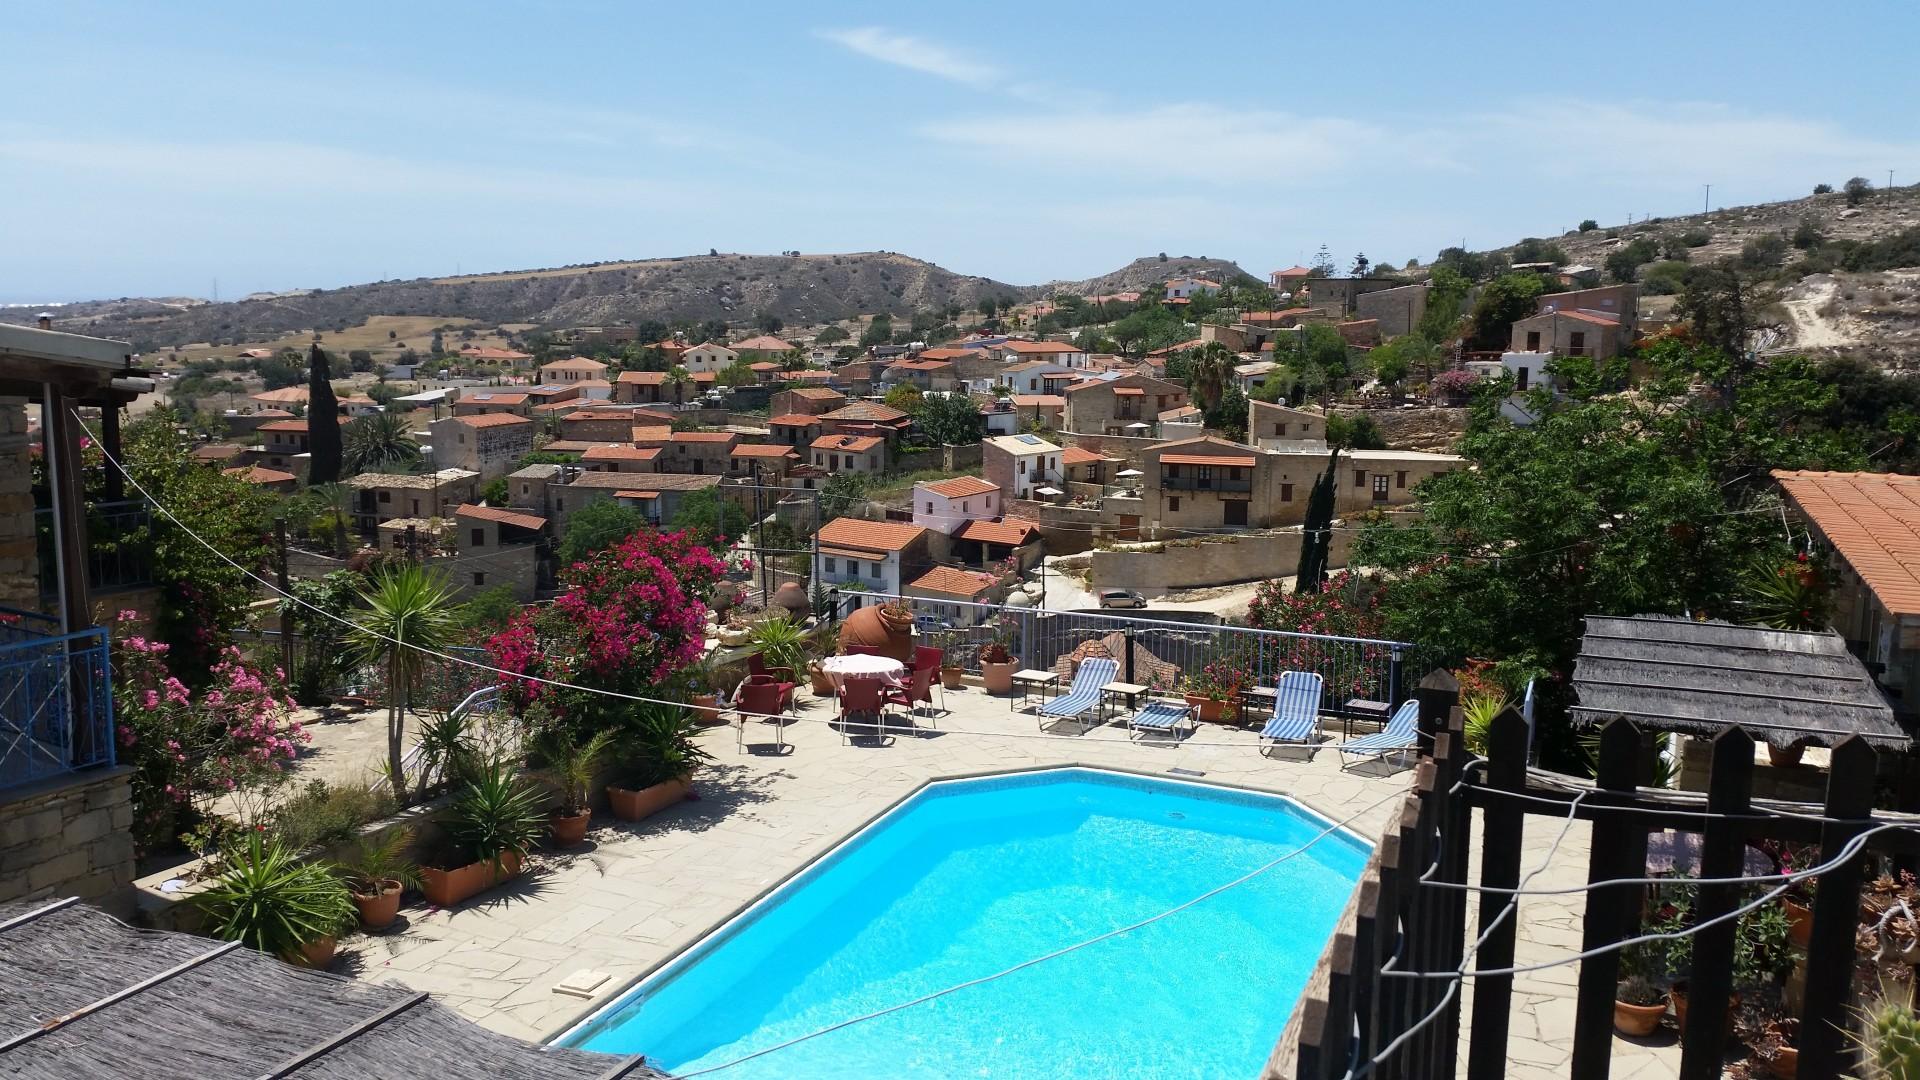 Zwembad Cyprus Villages, Tochni, Cyprus